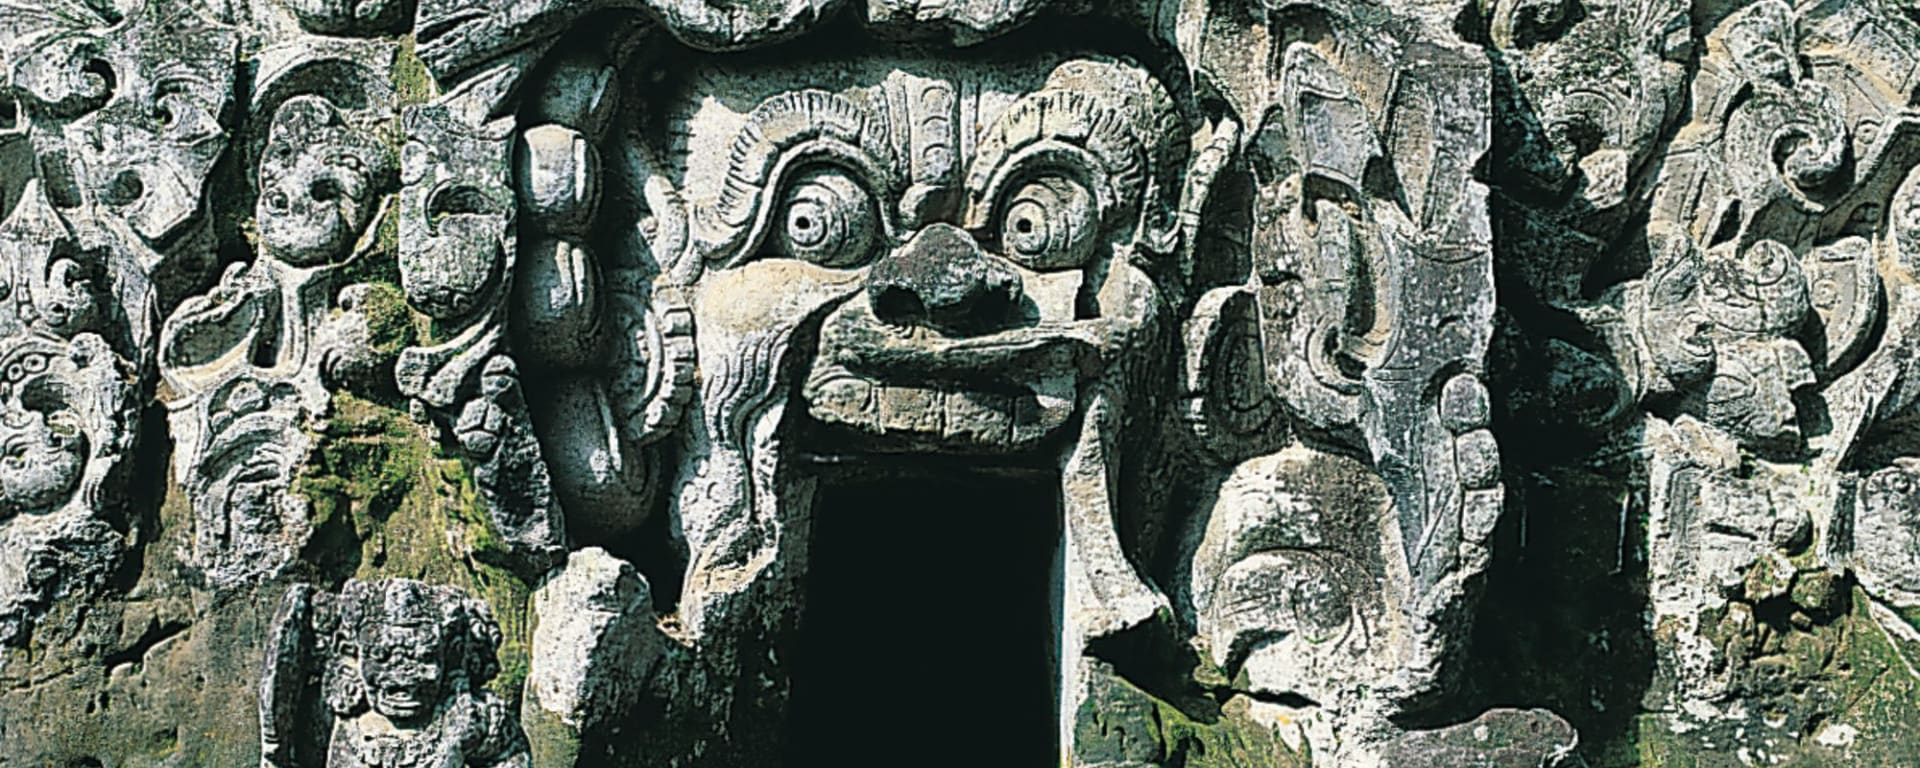 Ubud und Umgebung in Südbali: Bali Elephant Cave Goa Gajah